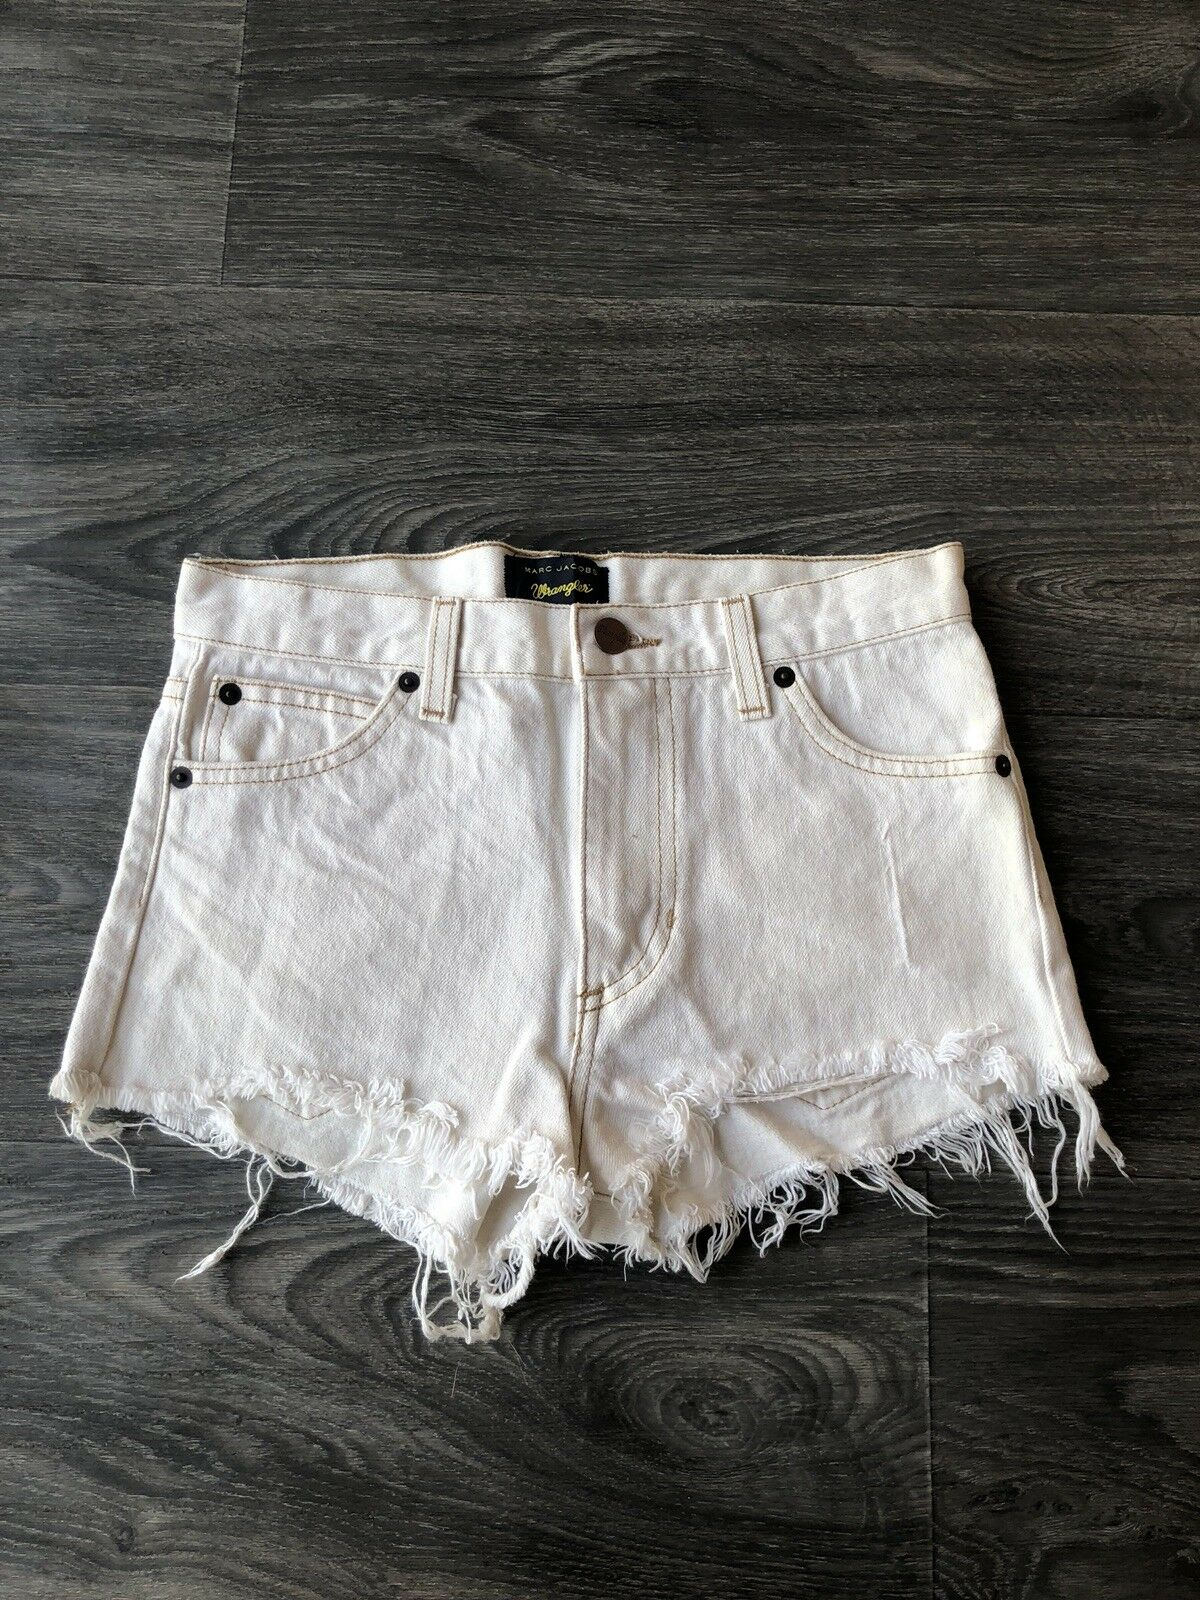 Marc Jacobs Wrangler Women's Denim Mini Shorts Ivory White Wash Size 0